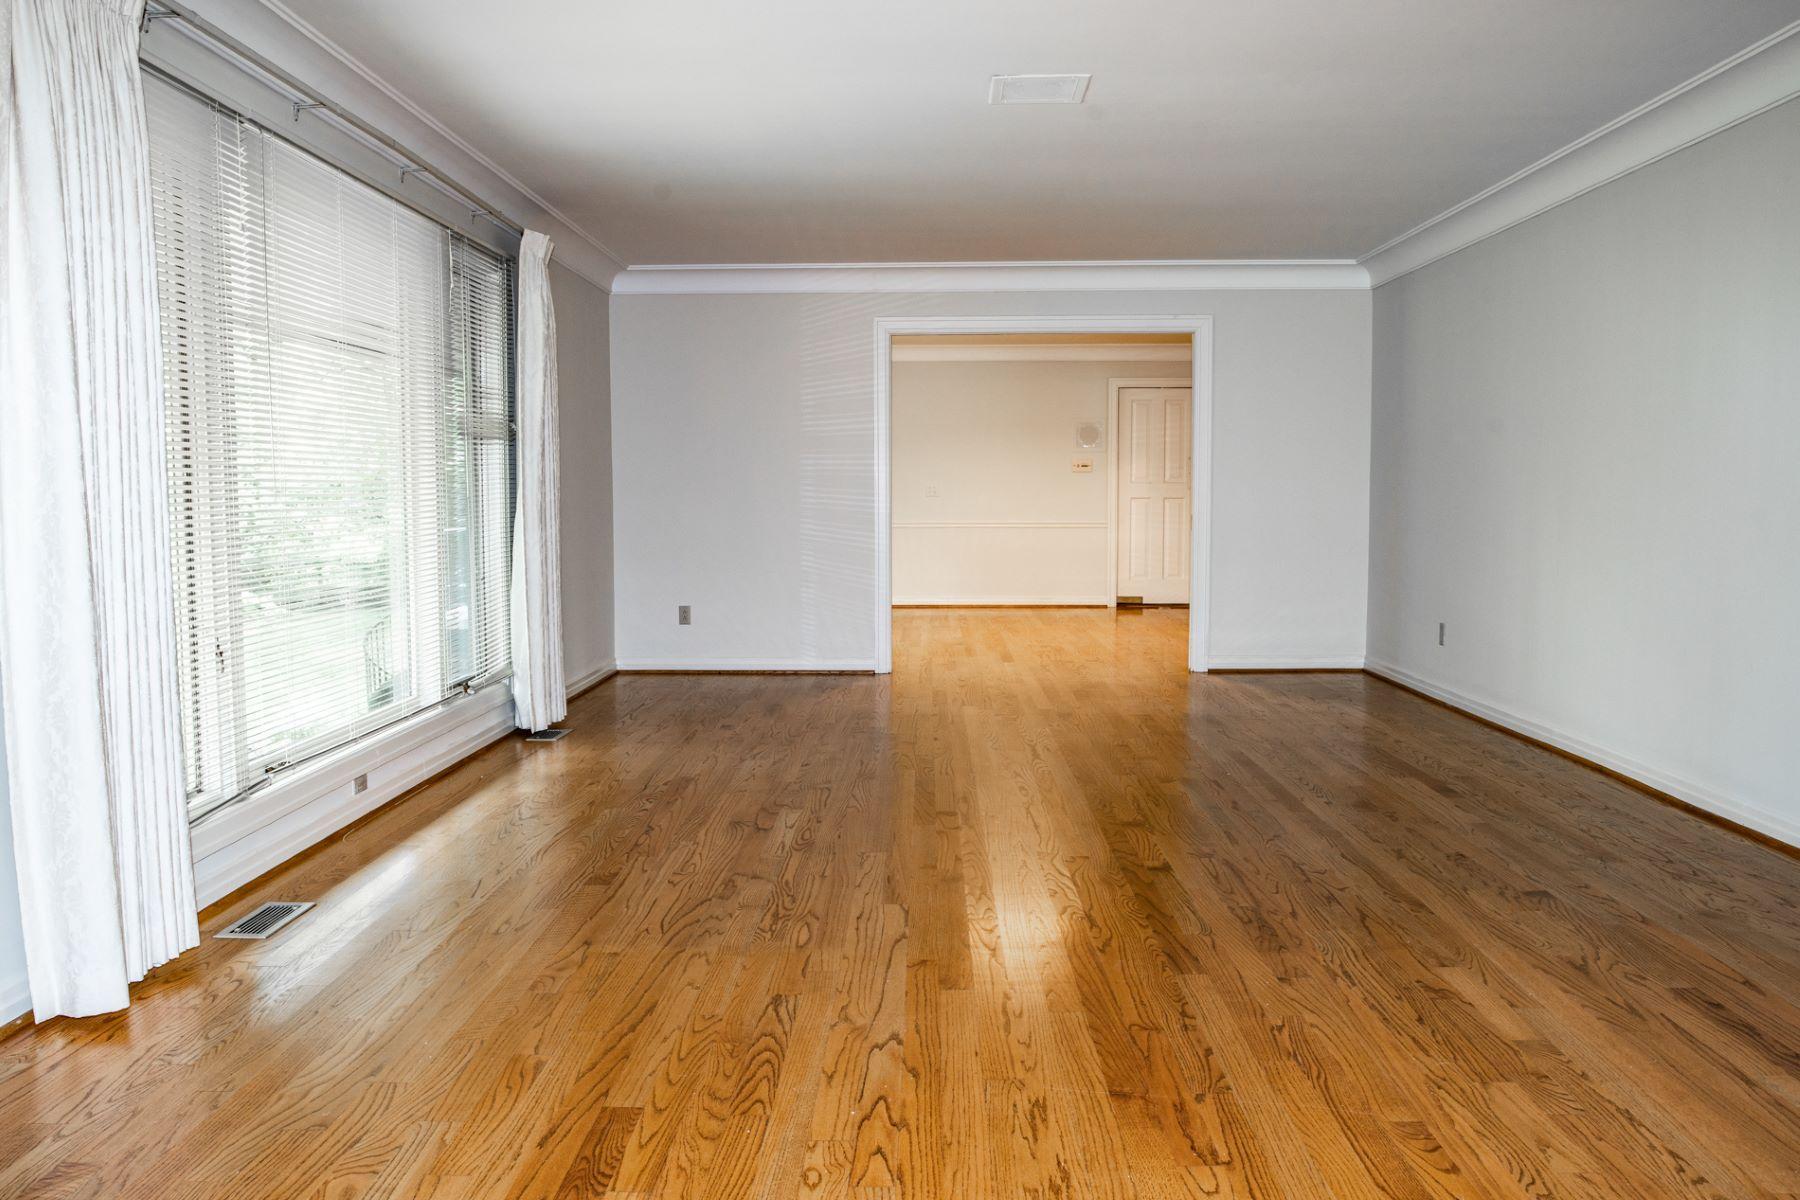 Additional photo for property listing at Prime Ladue Location 10166 Winding Ridge Road Ladue, Missouri 63124 United States